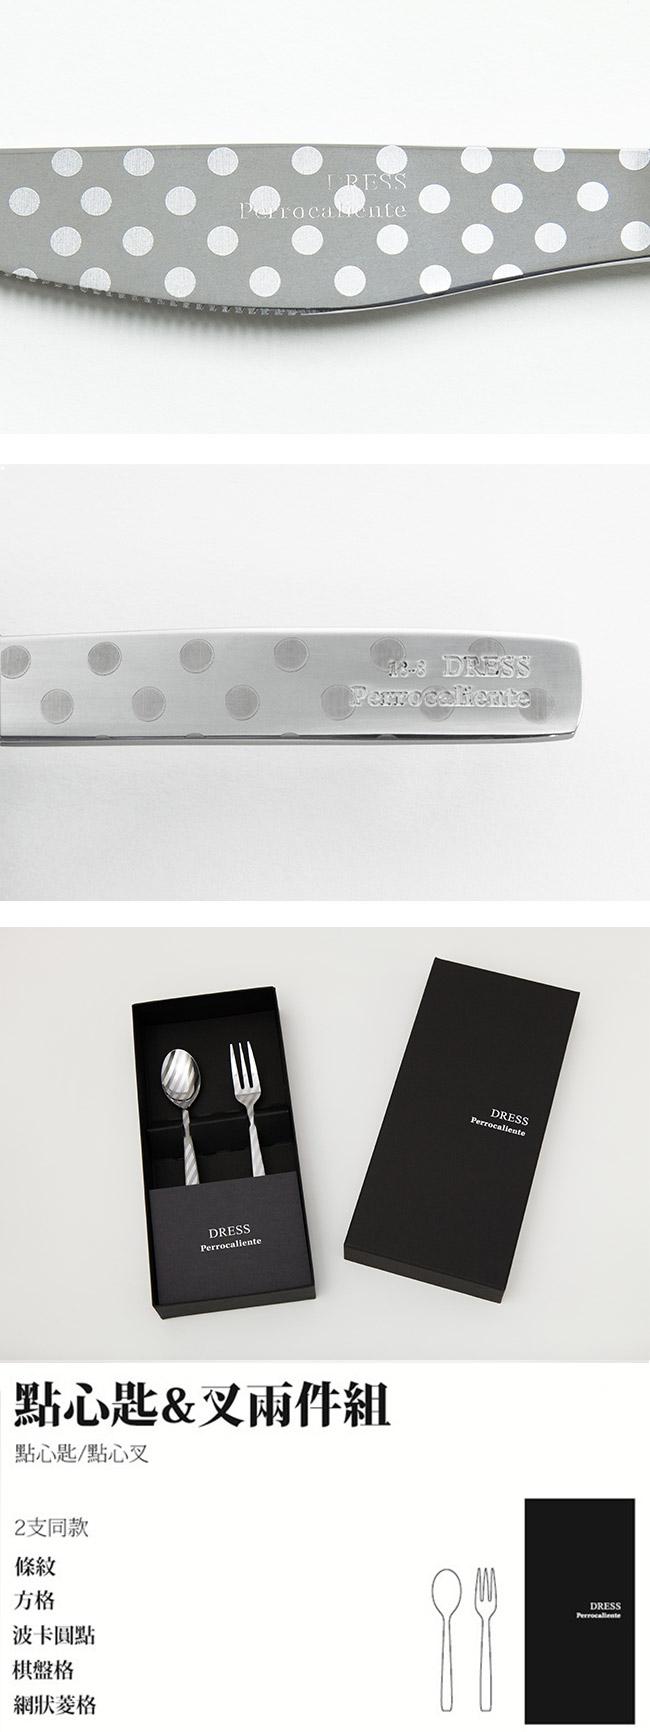 Perrocaliente Dress Gift Set 銀色盒裝餐具組 點心匙&叉兩件組 波卡圓點